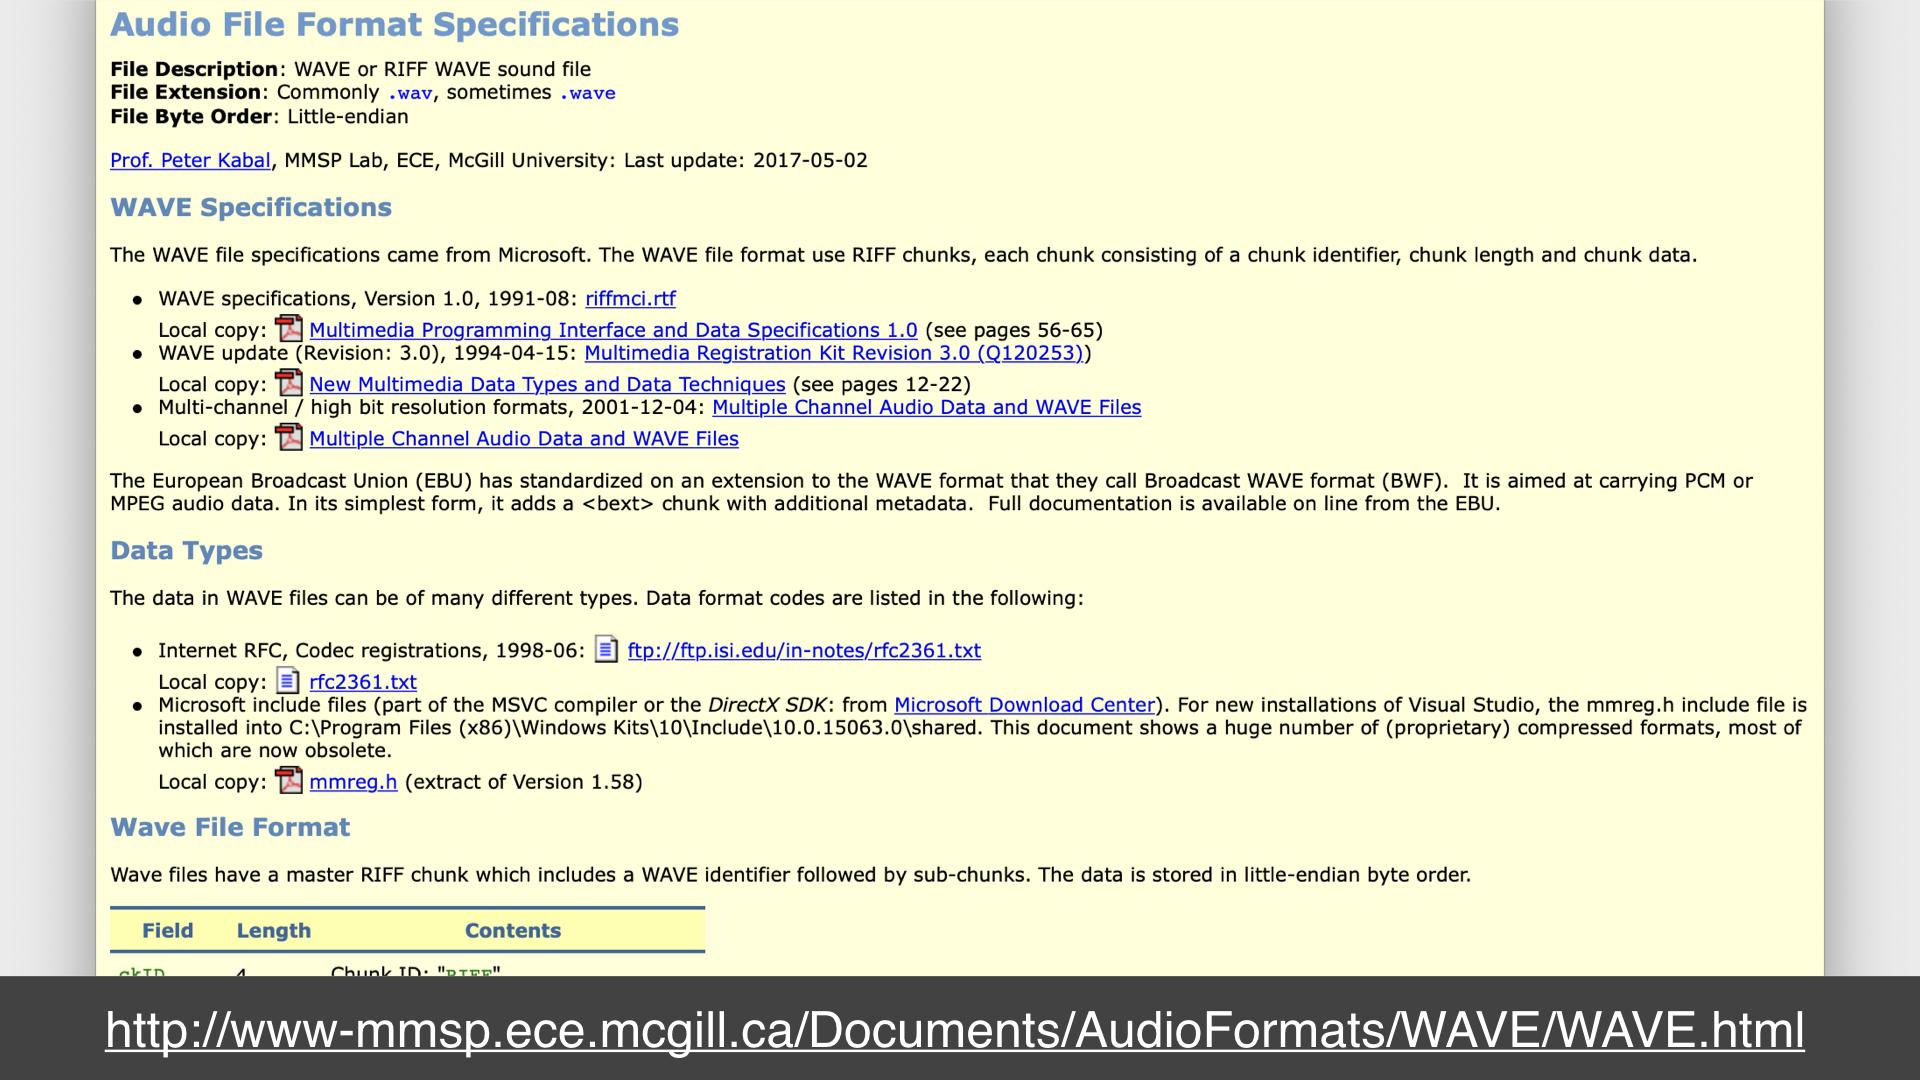 Screenshot of a webpage describing the WAV file format specification; url: http://www-mmsp.ece.mcgill.ca/Documents/AudioFormats/WAVE/WAVE.html